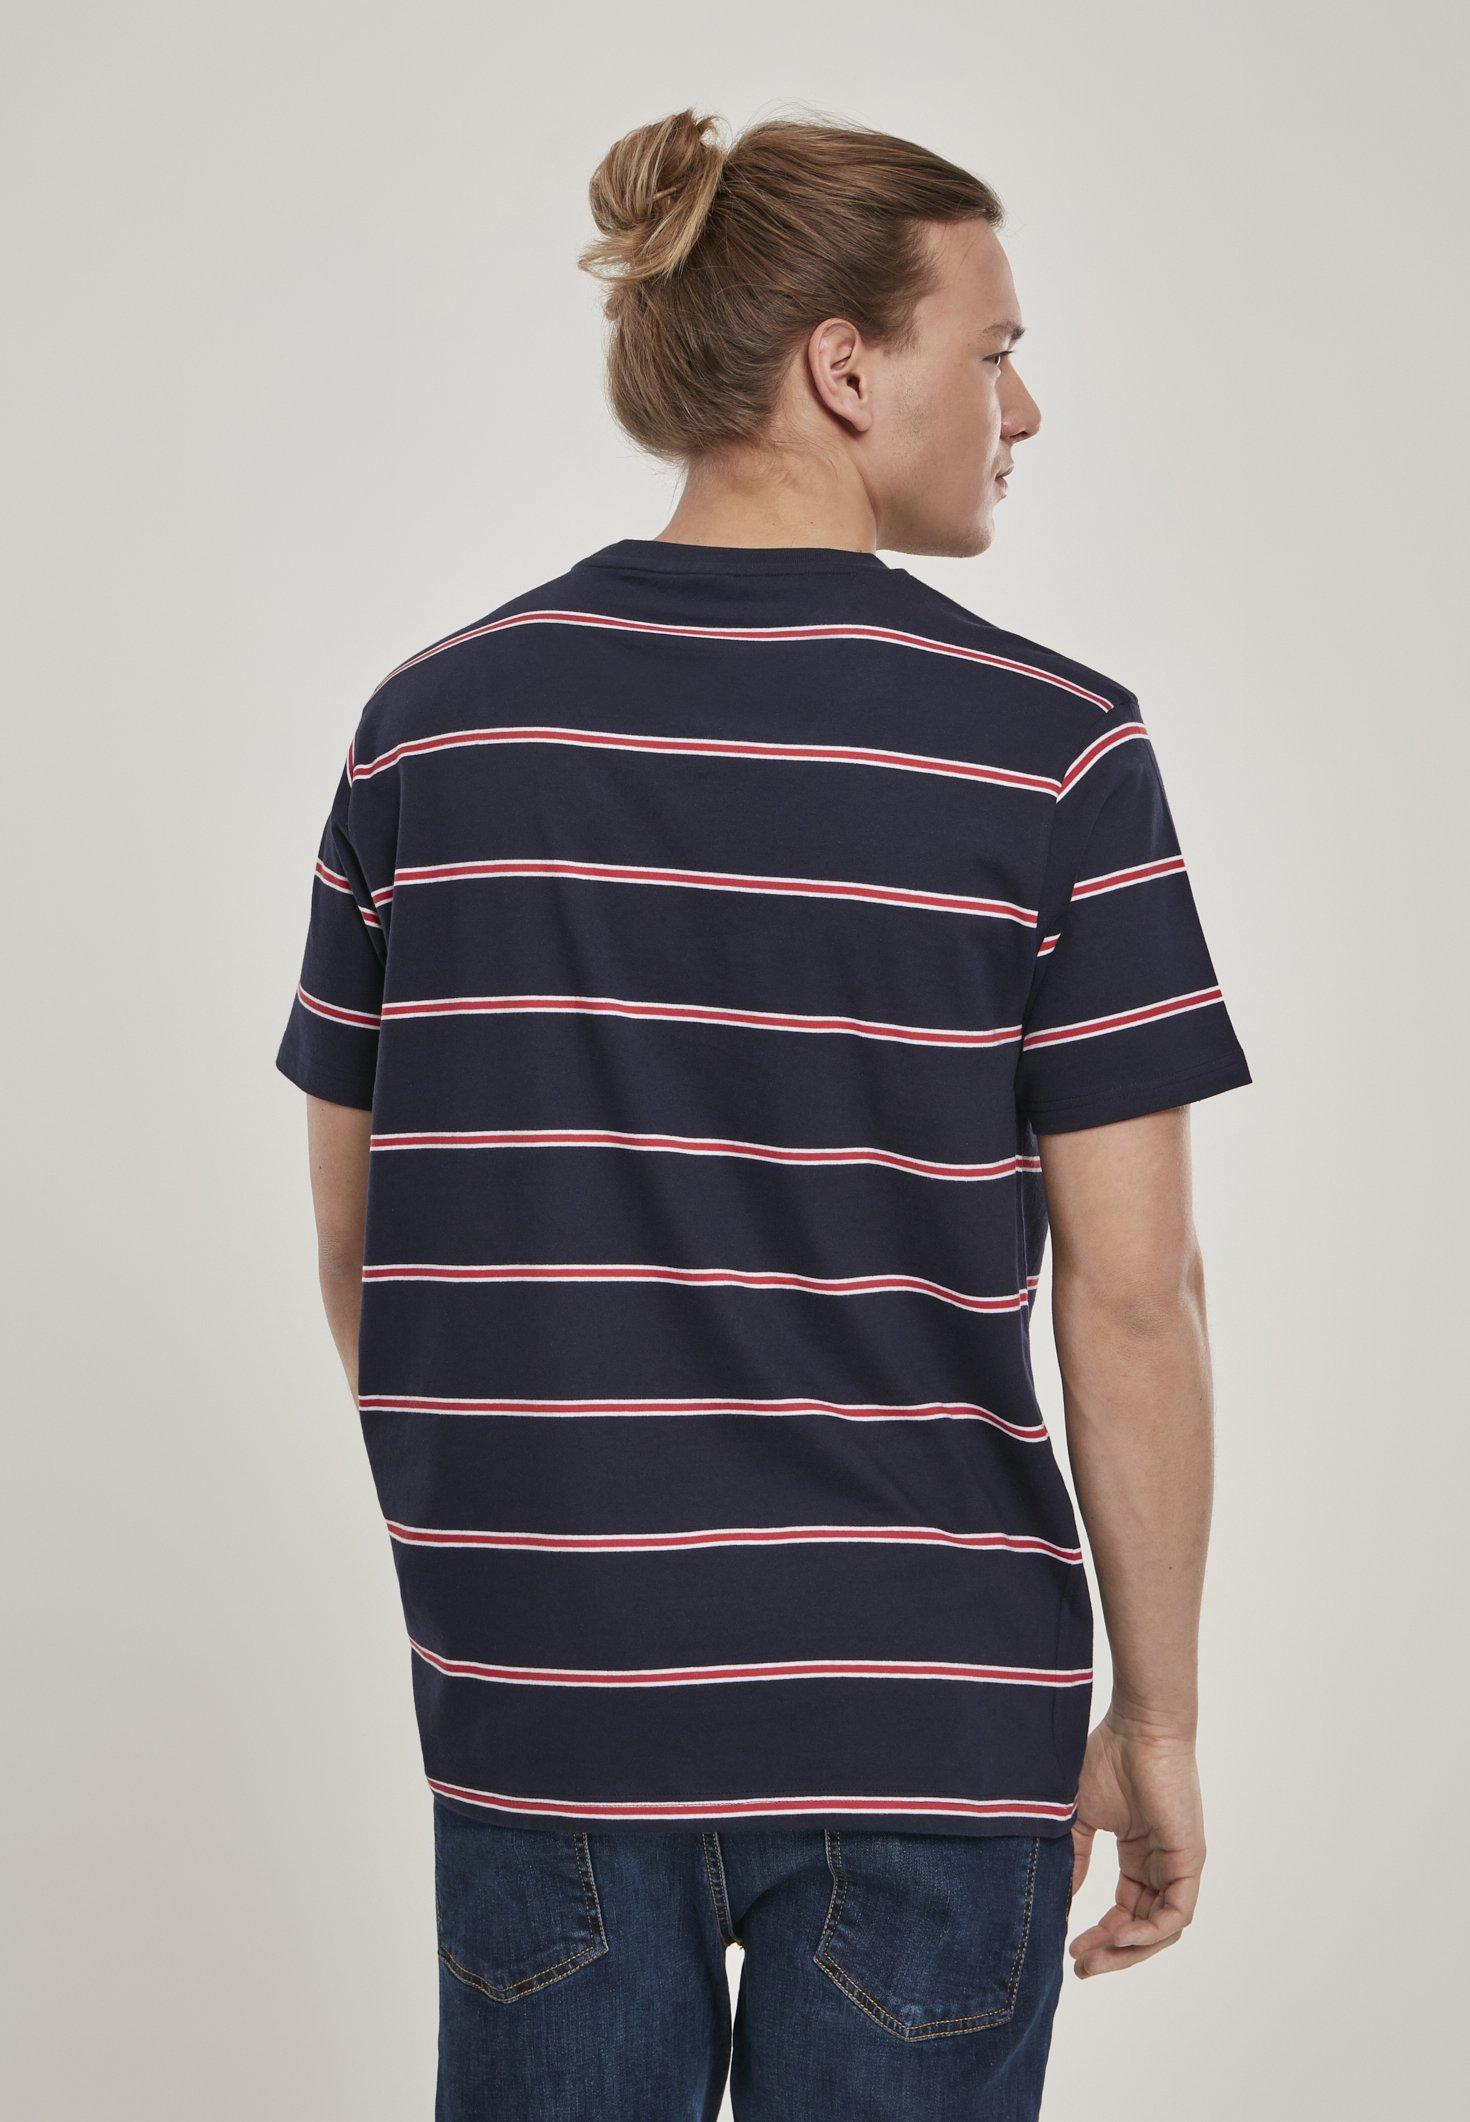 Urban Classics Print T-shirt - midnightnavy/red 8bHcB